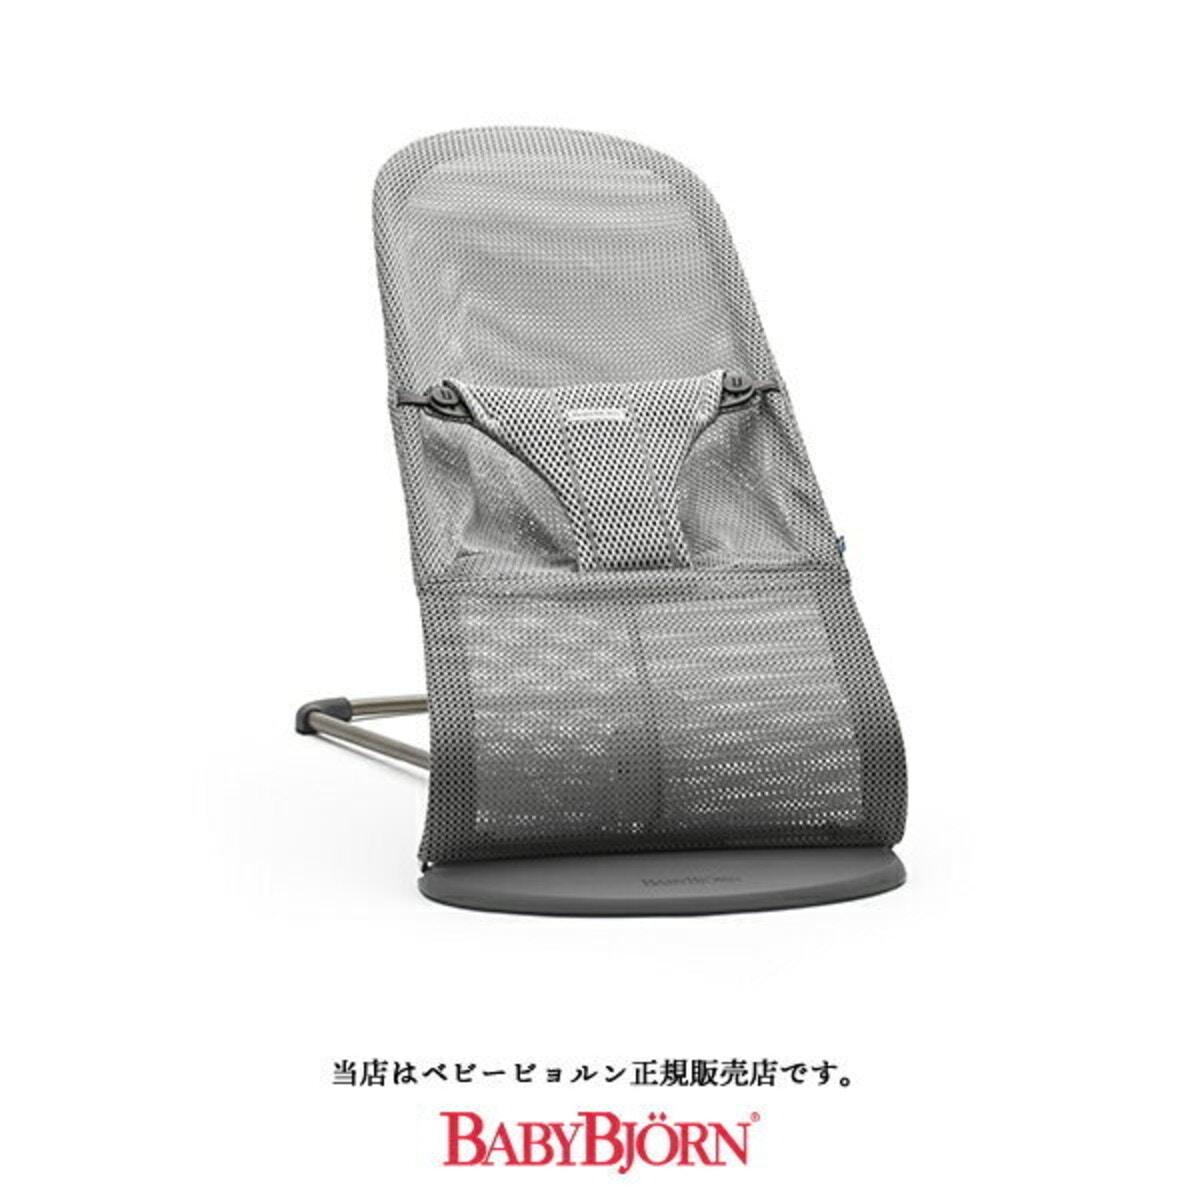 【BabyBjorn ベビービョルン正規販売店】バウンサー Bliss Air(ブリスエアー)006018グレー